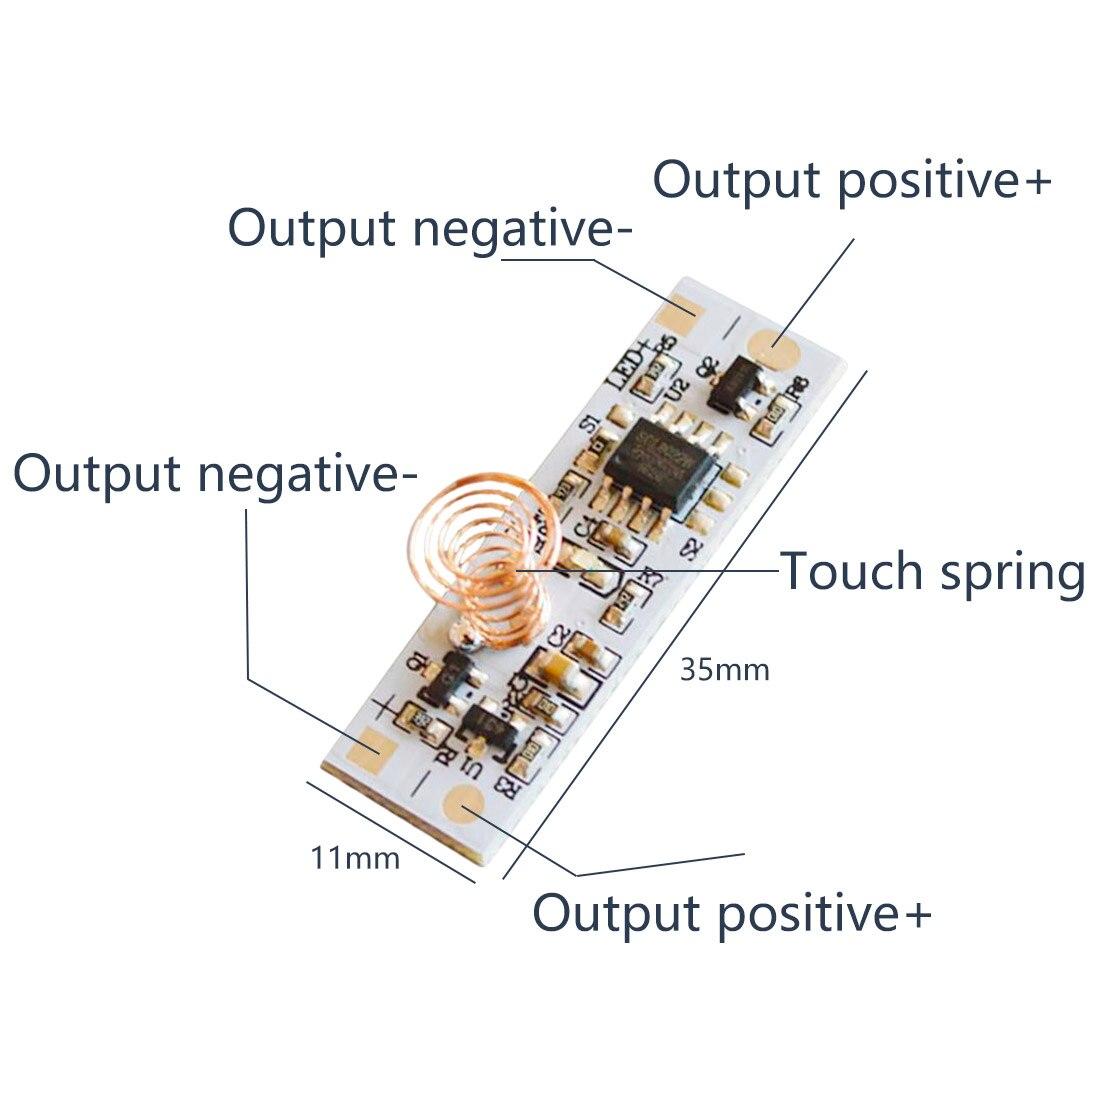 Interruptor de Control de atenuador LED-24 V CC 3 36W 3A interruptor de Sensor táctil capacitivo interruptor de resorte de la bobina para la tira de luz LED de hogar inteligente